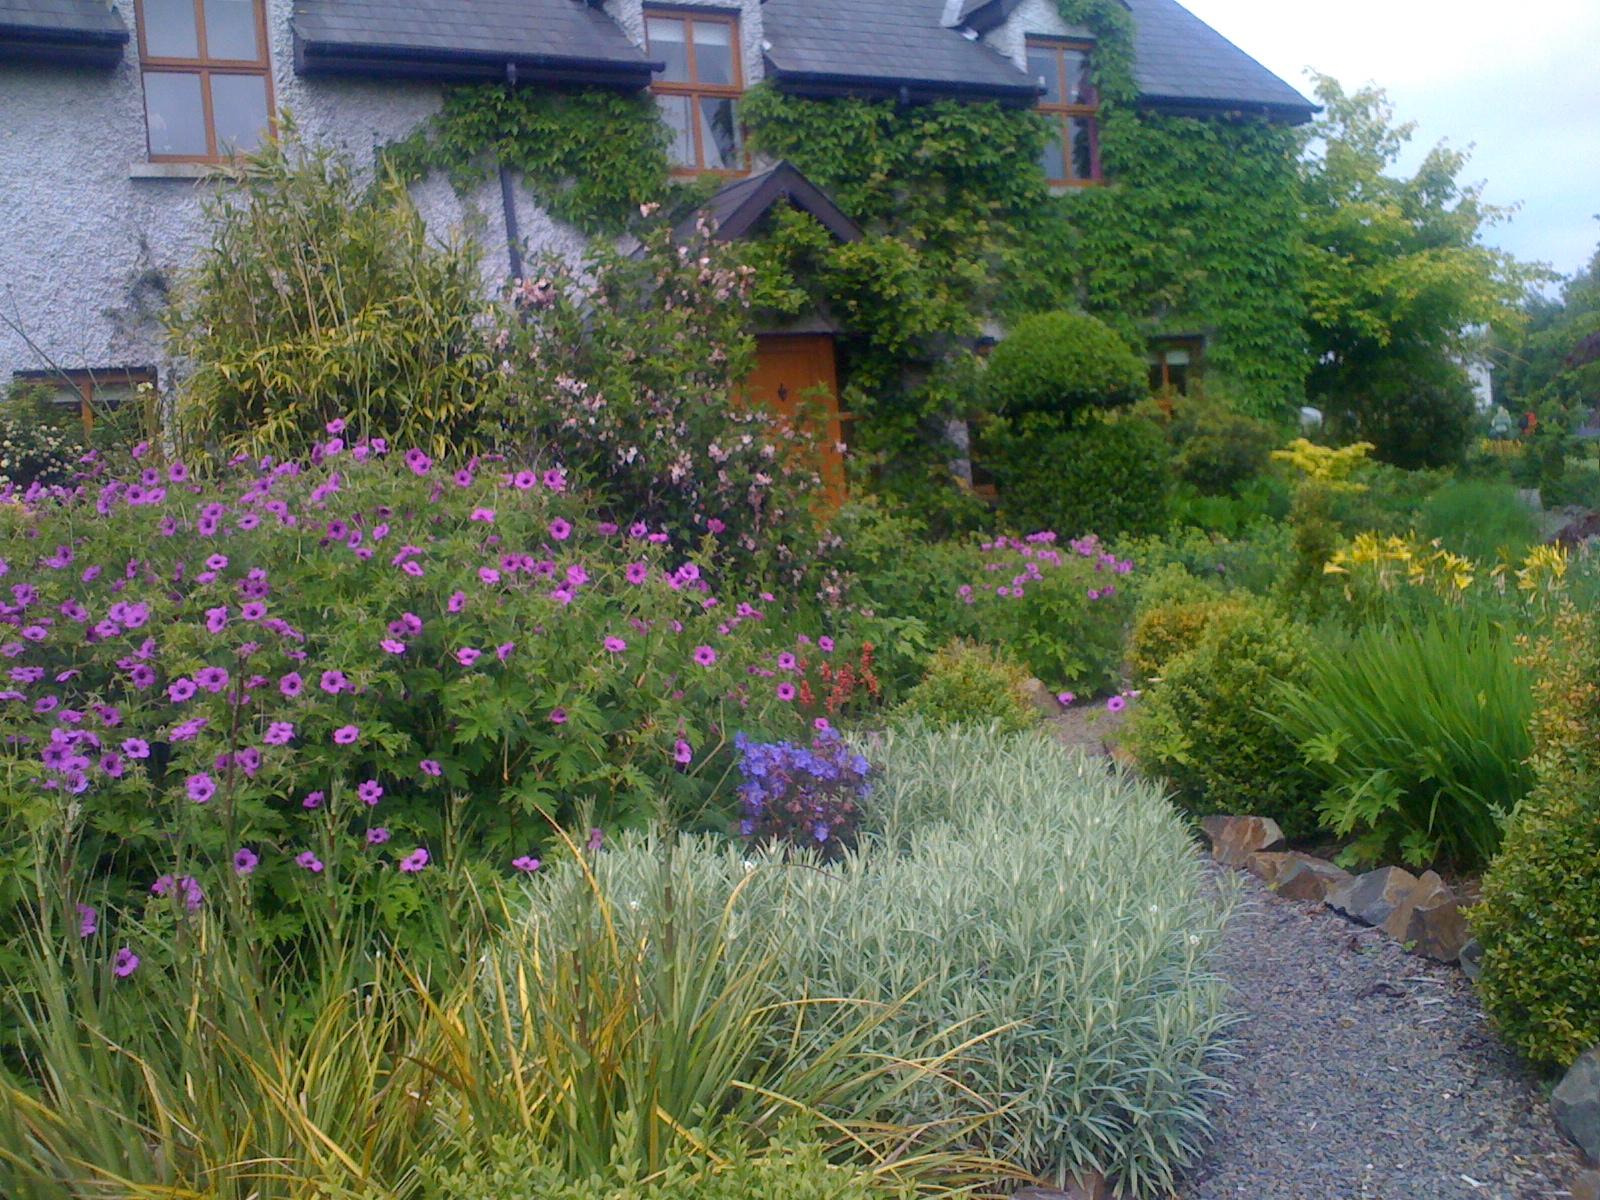 Kilmurry Nursery Garden by Ciaran Burke